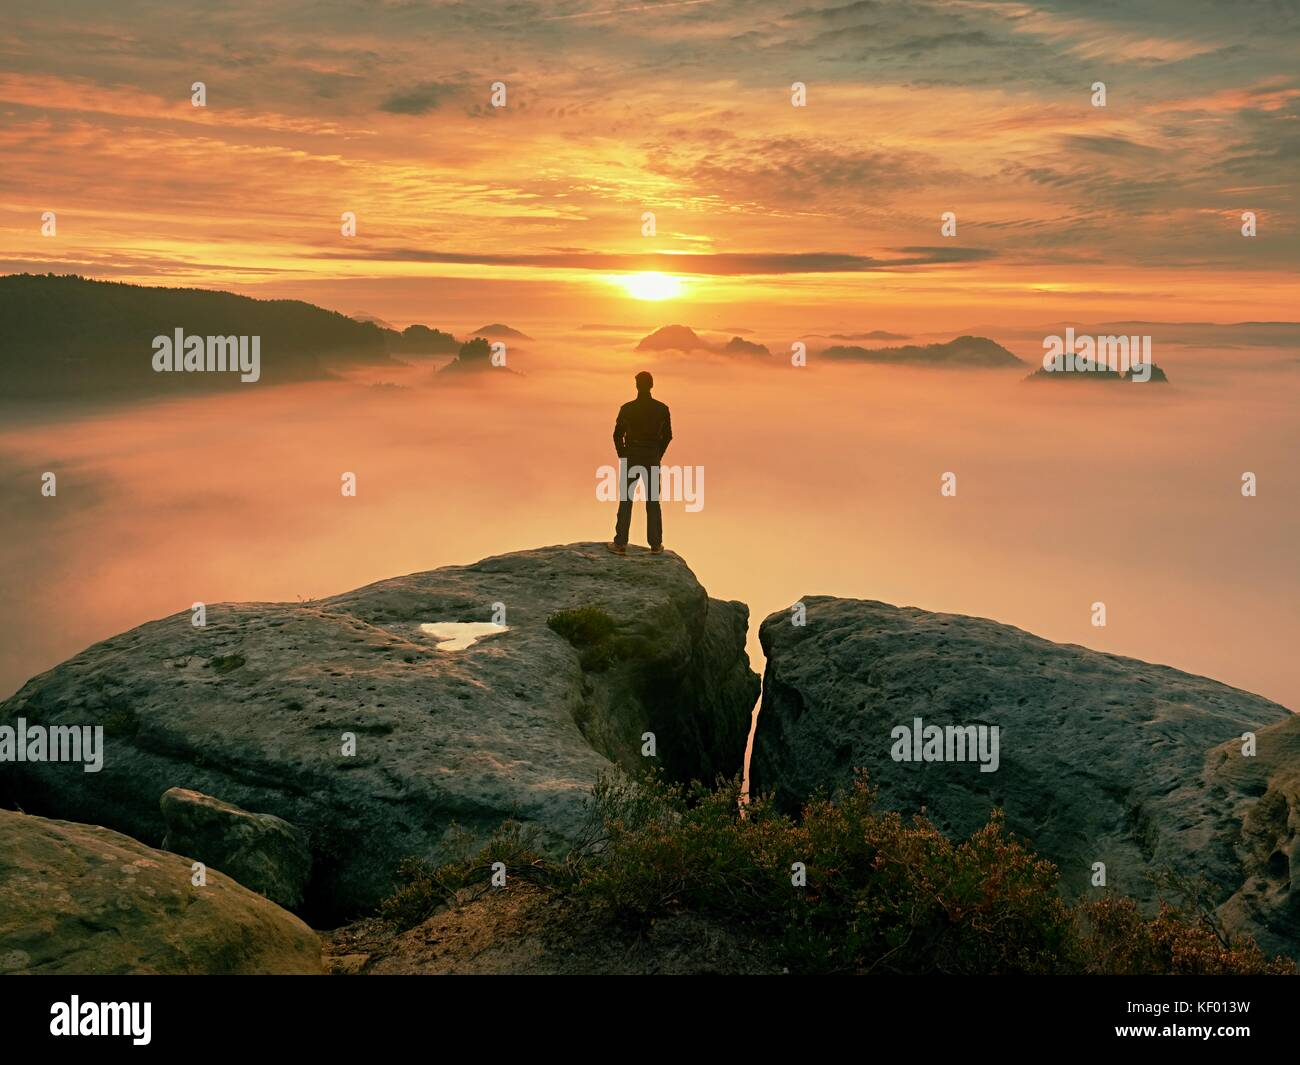 Man steht allein an der Spitze der Rock. Wanderer beobachten, Herbst Sonne am Horizont. schöner Moment das Stockbild